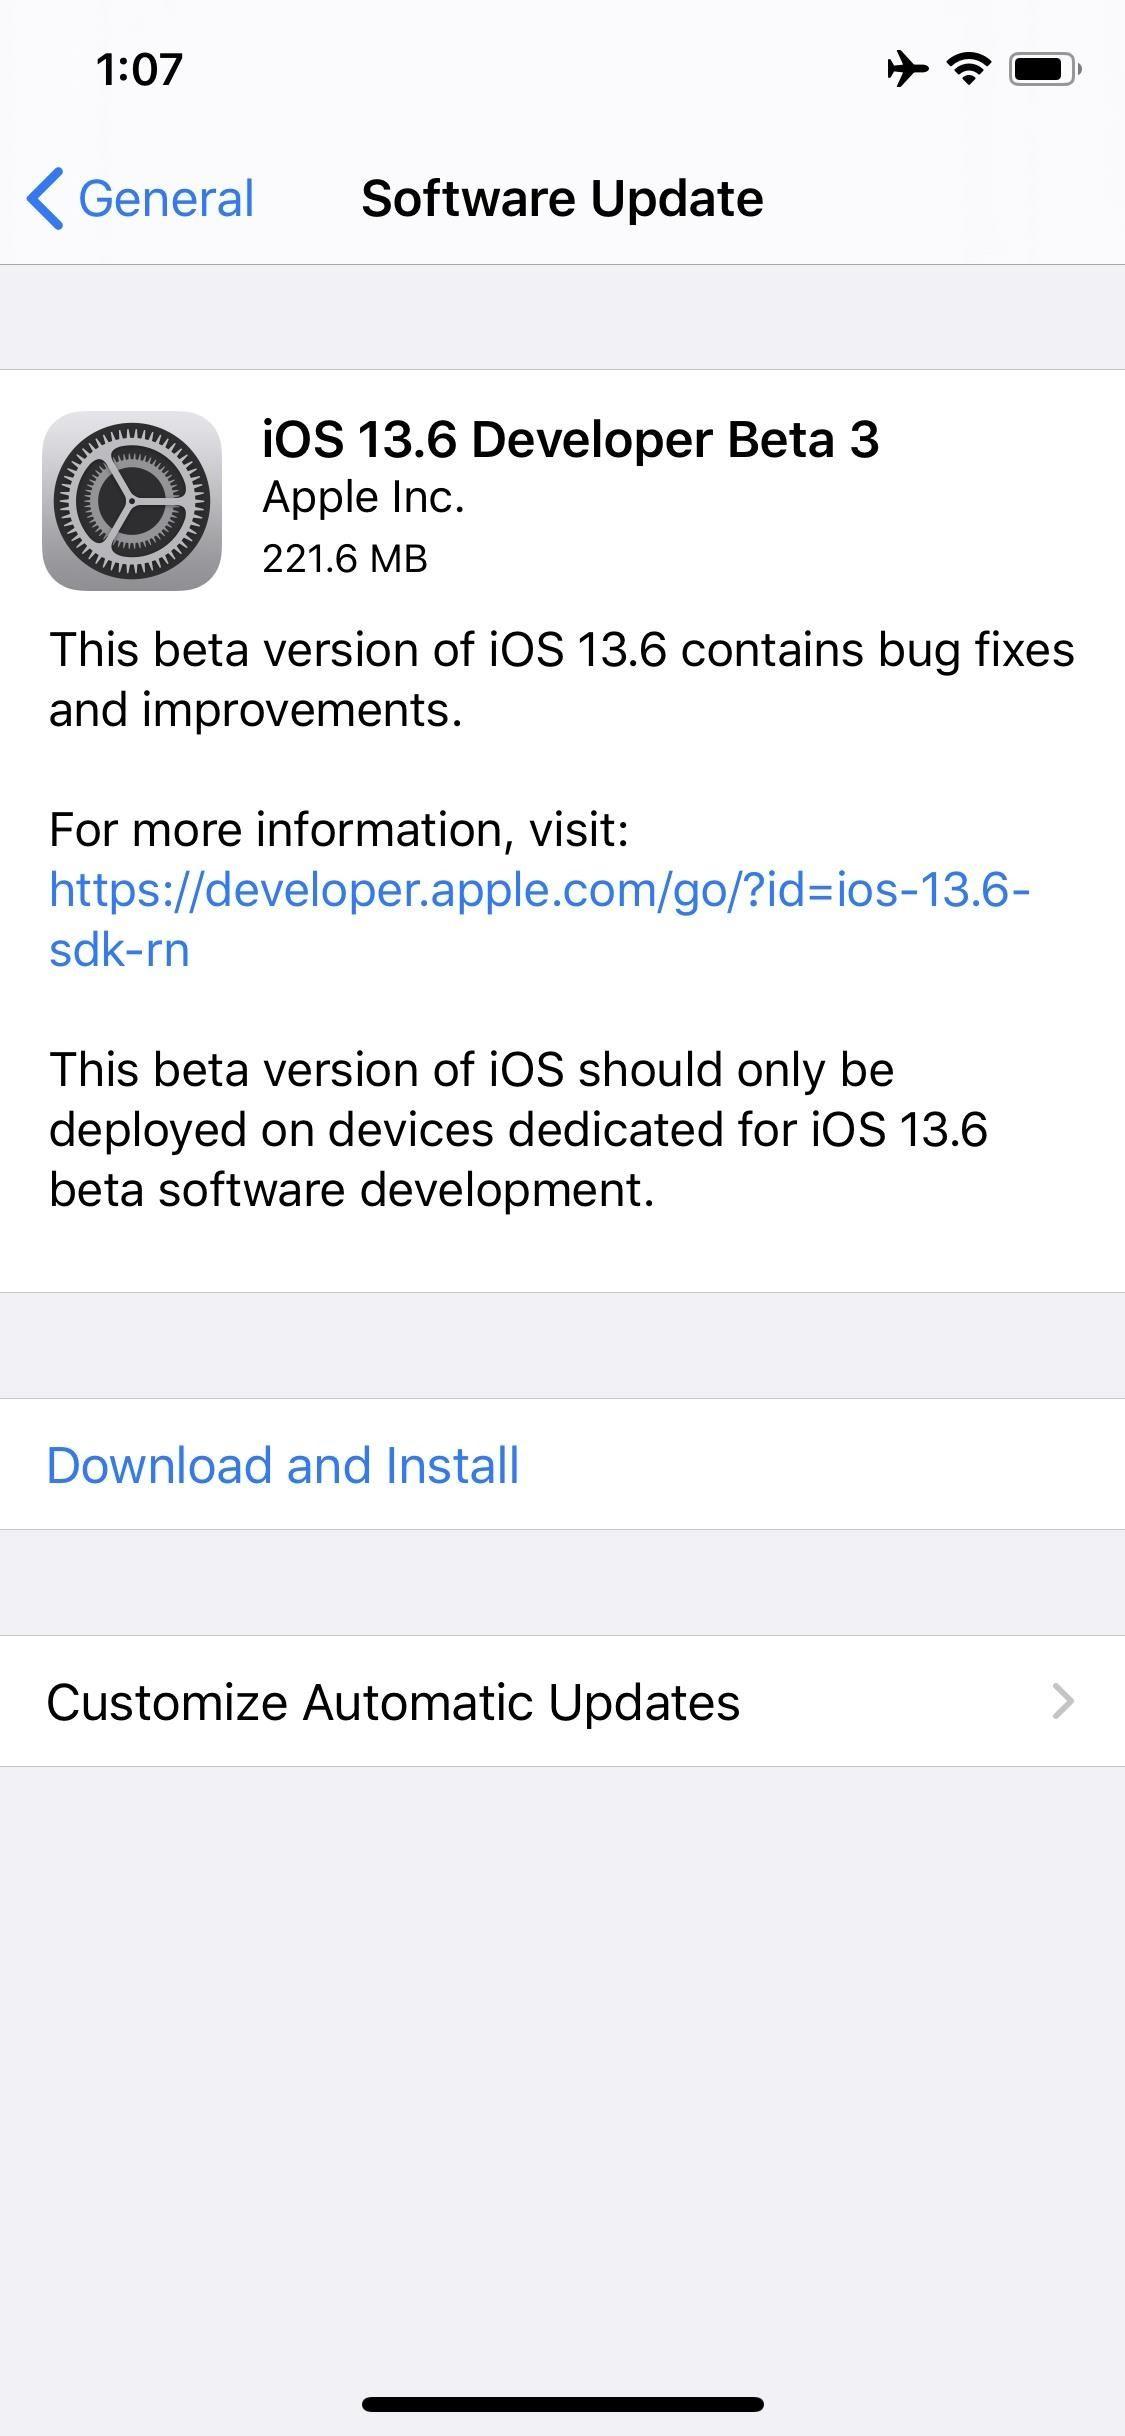 Apple Releases iOS 13.6 Developer Beta 3 for iPhone